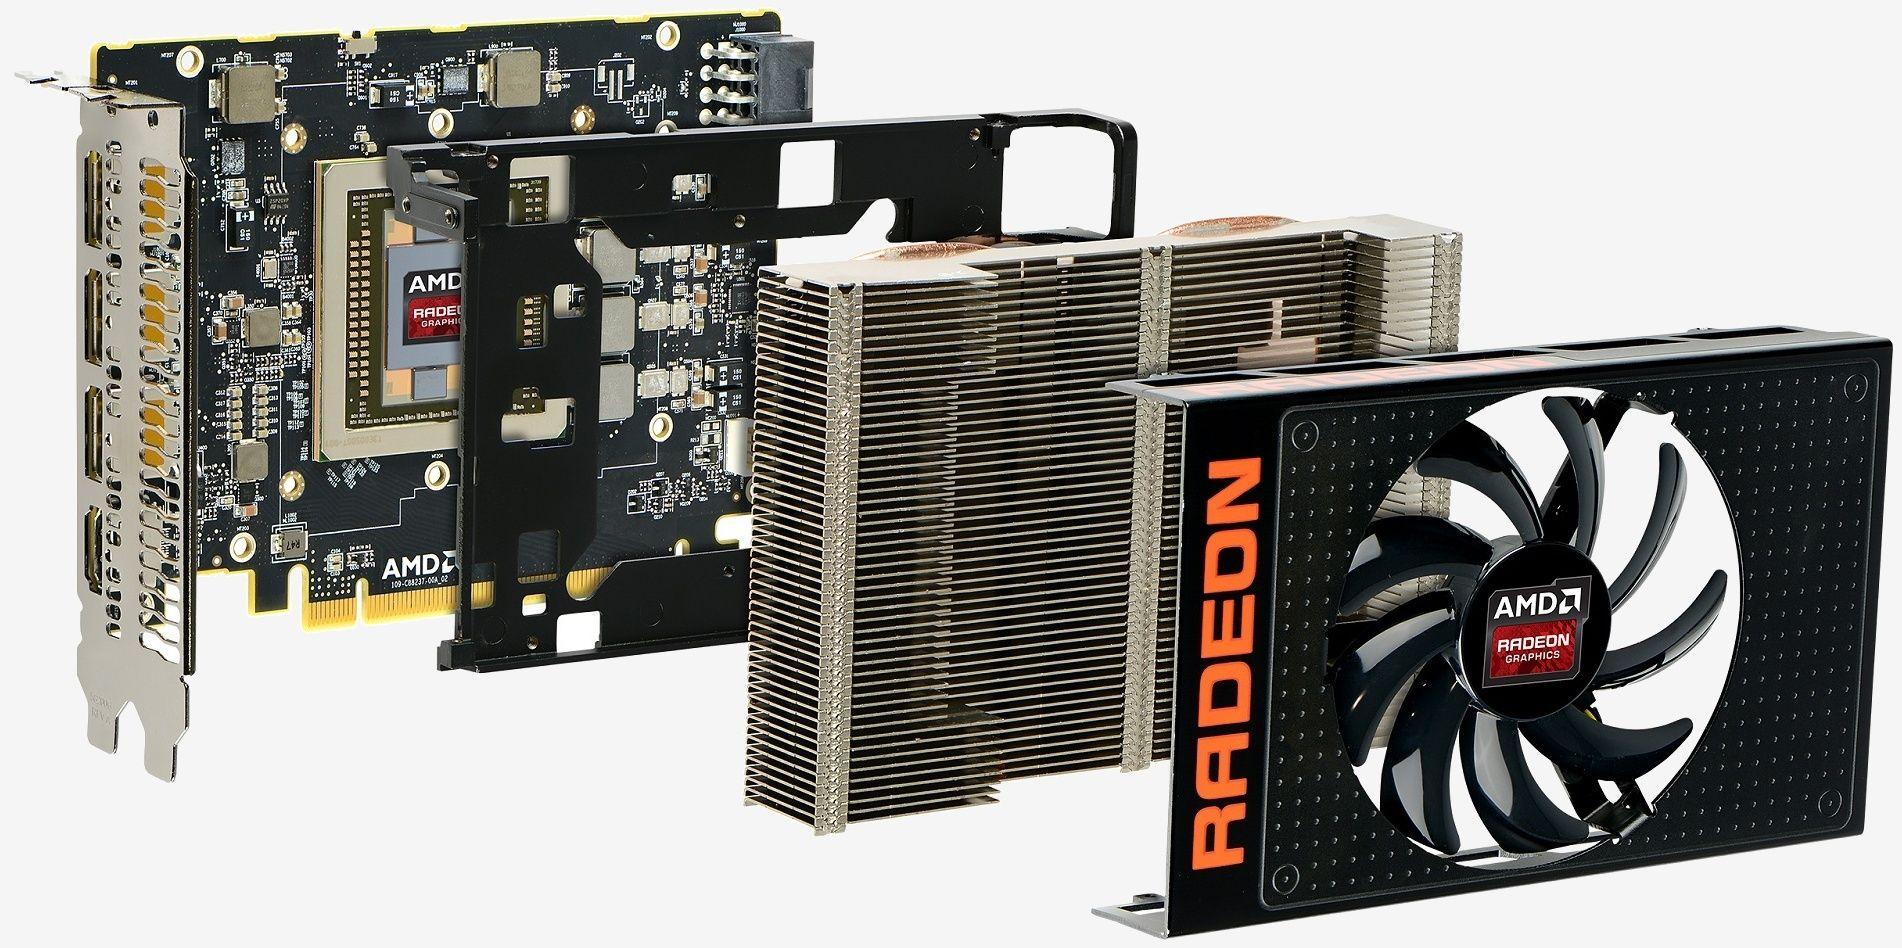 Radeon R9 Nano Review Mini 4K Gaming Graphic card, Amd